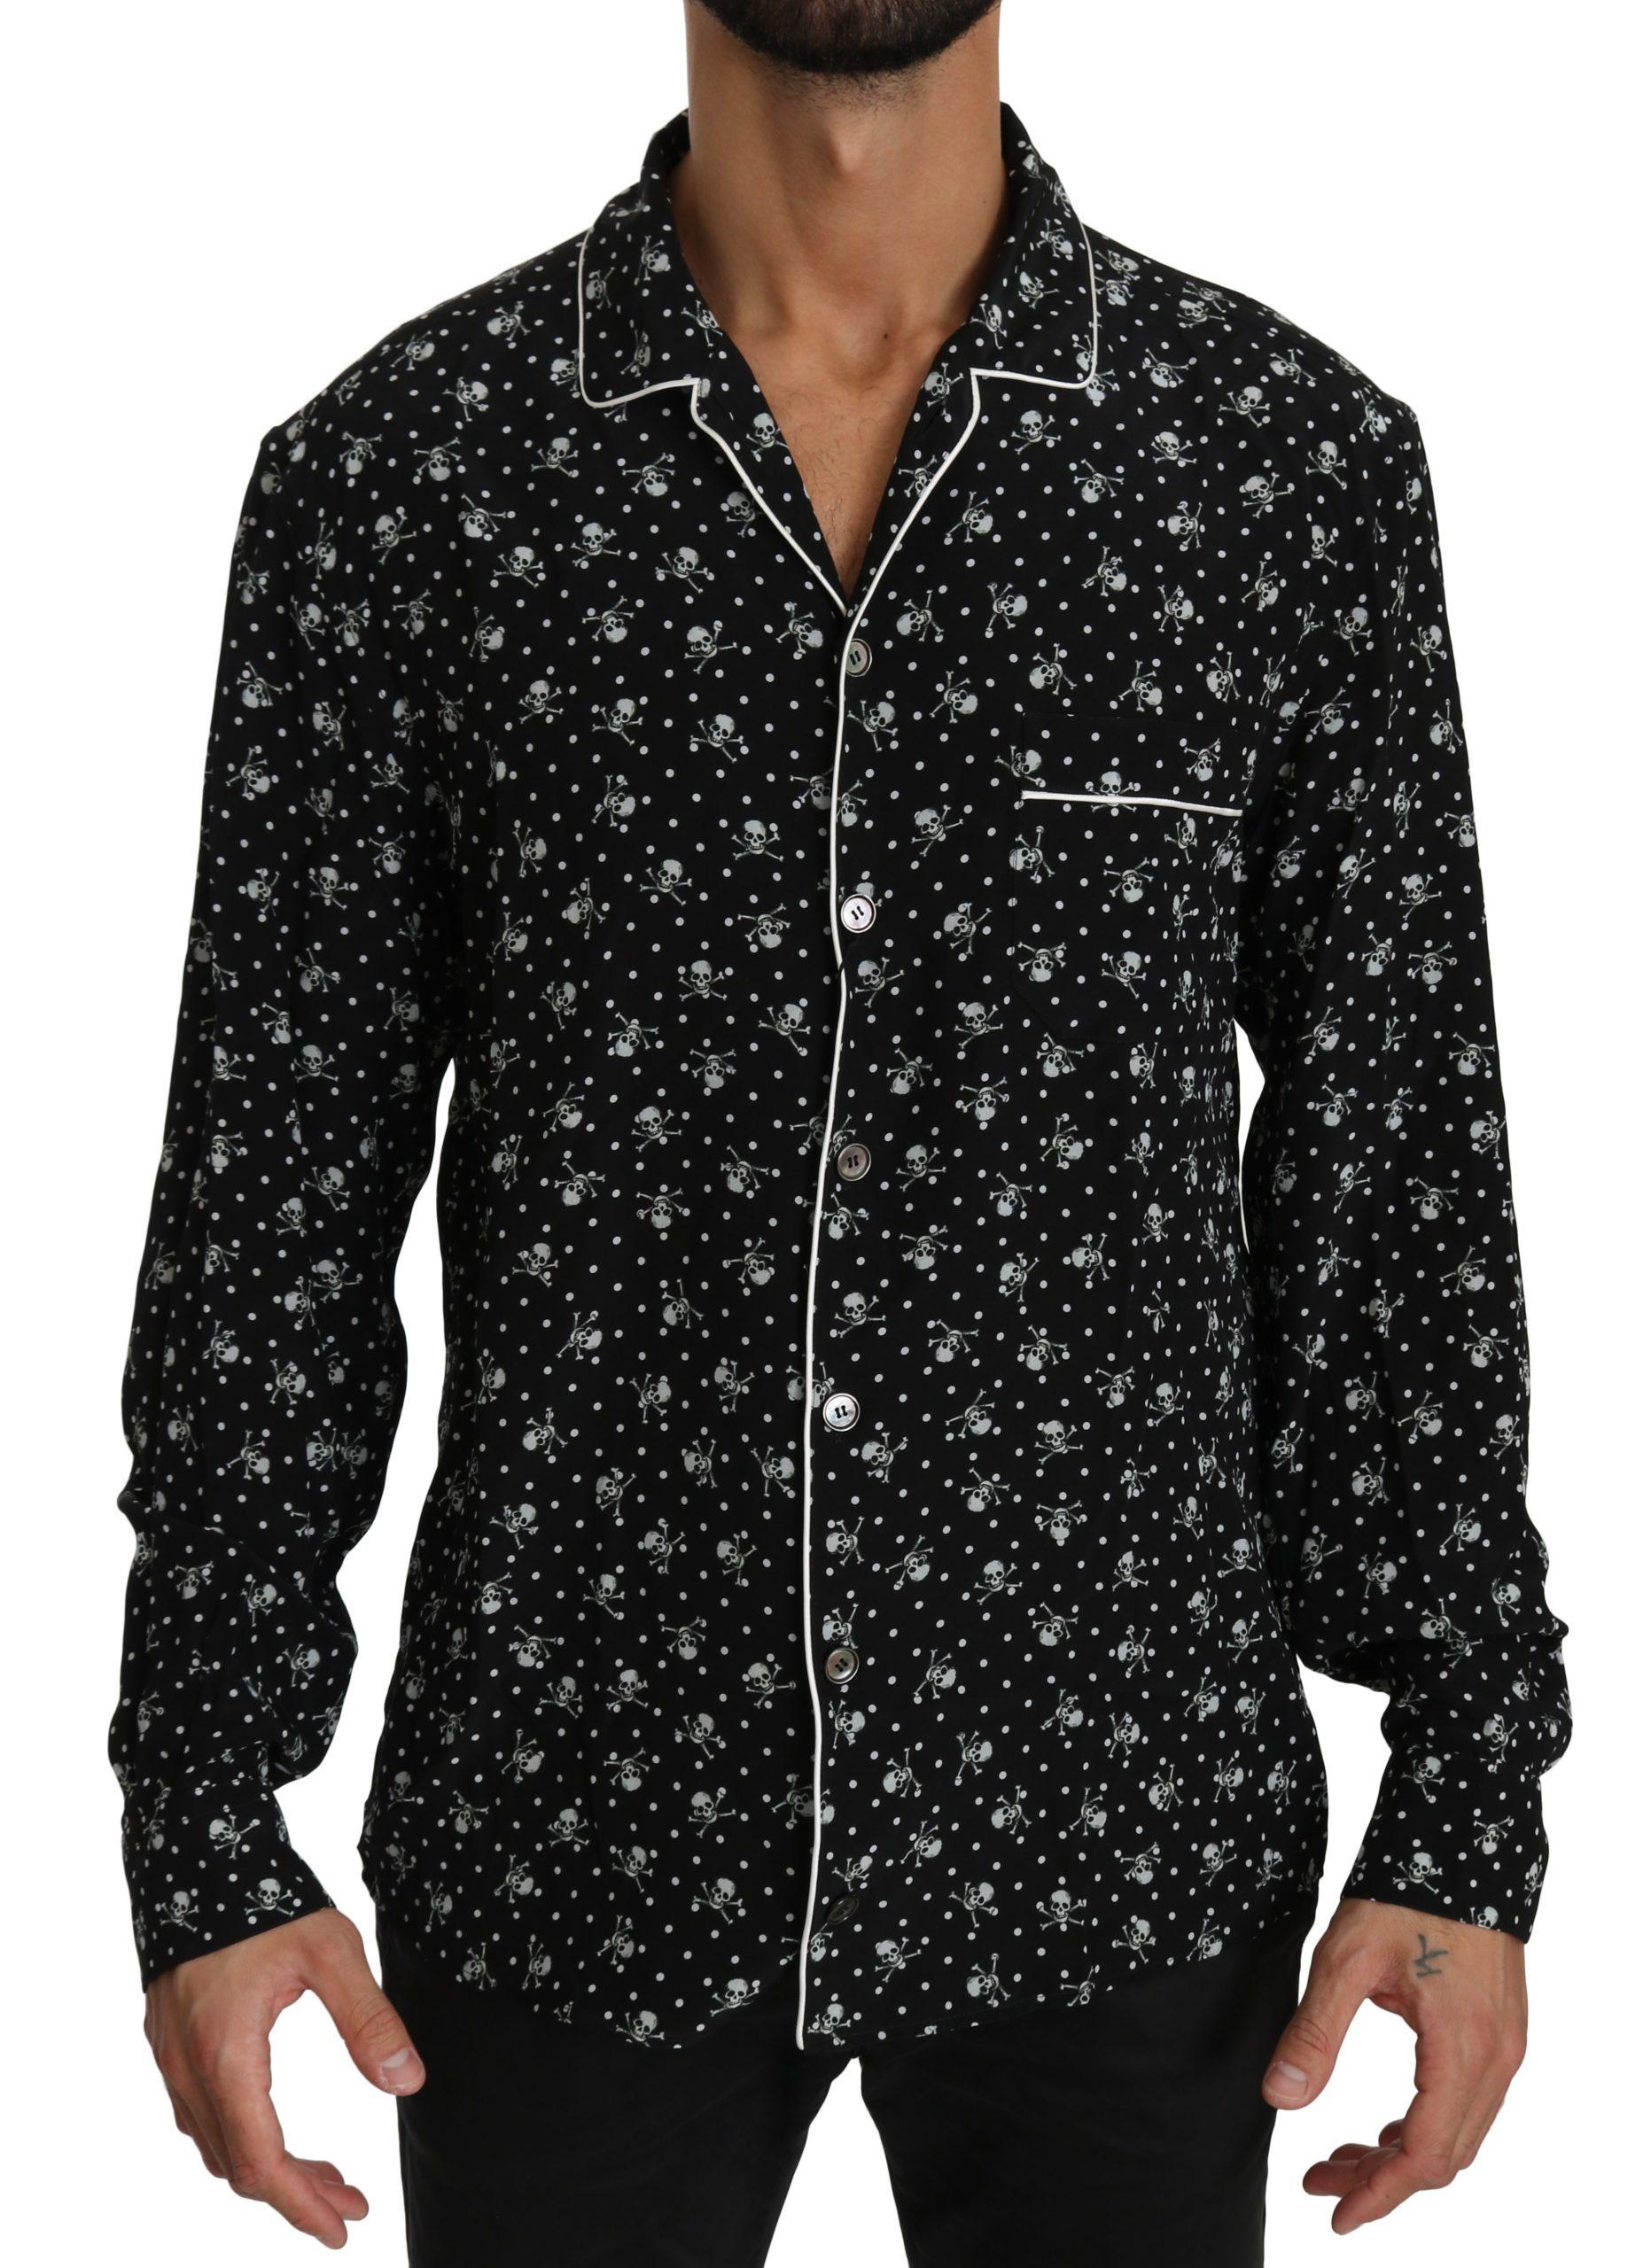 Dolce & Gabbana Men's Skull Print Silk Sleepwear Shirt Black TSH4013 - IT39 | S